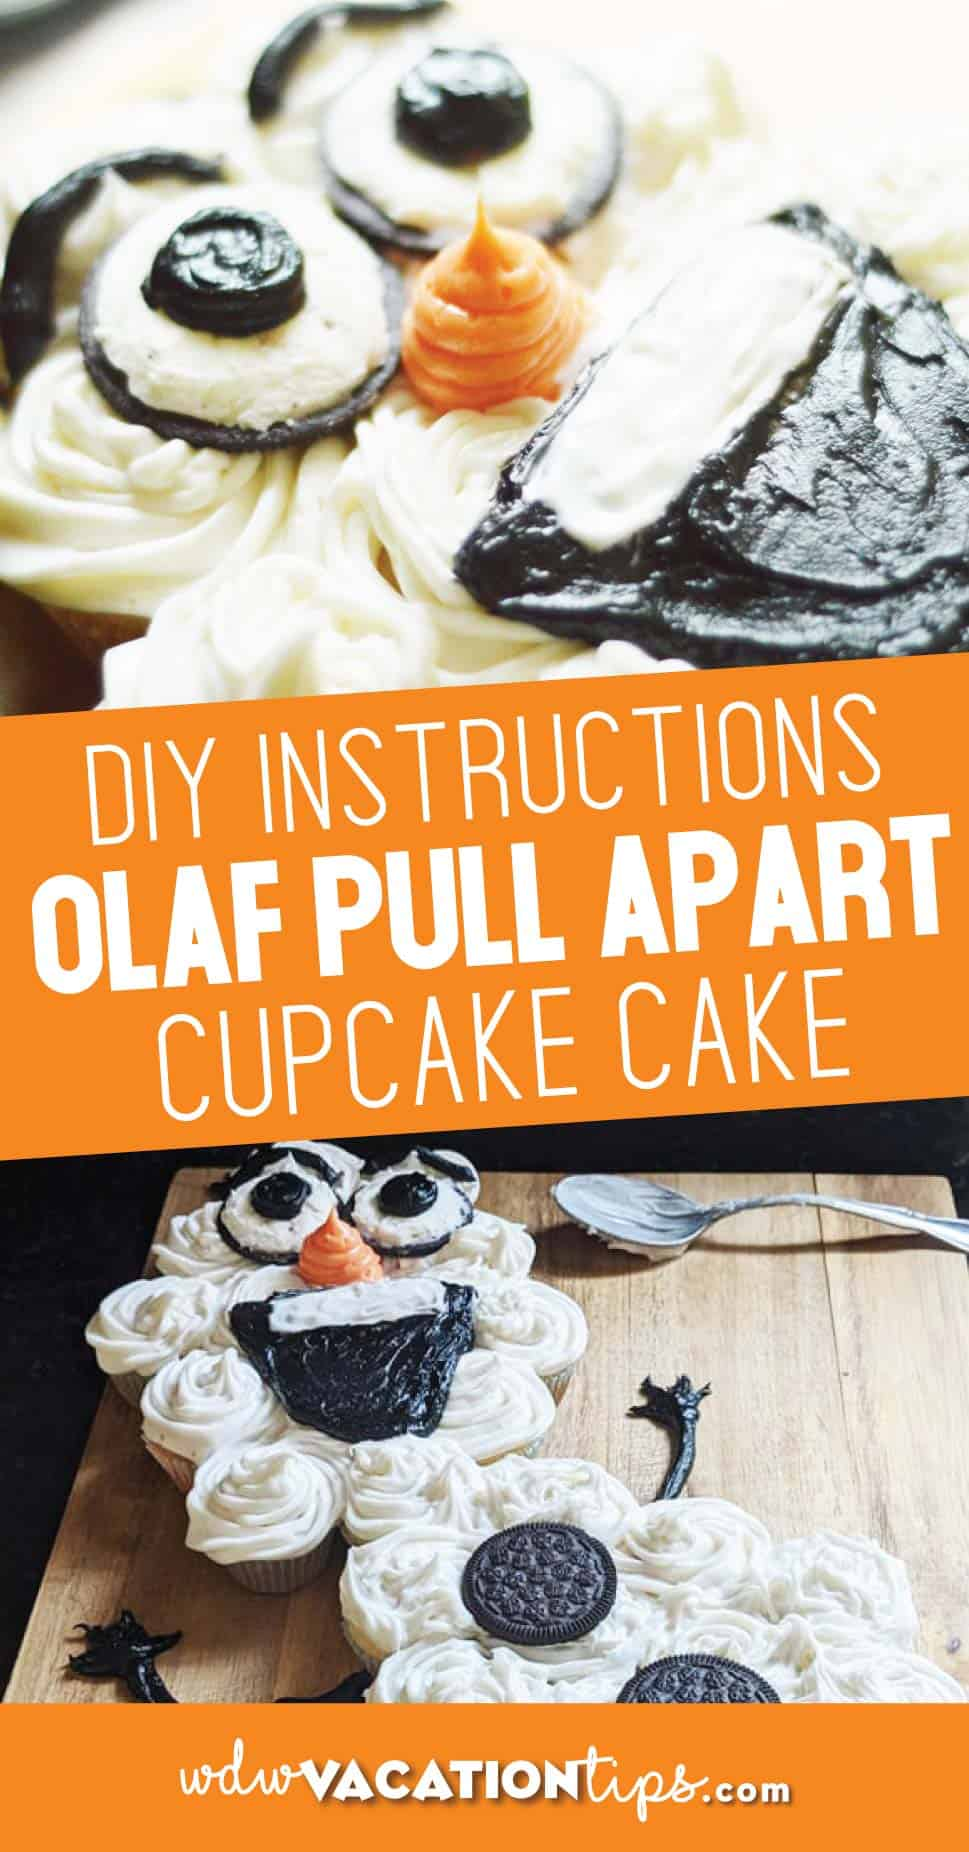 Olaf Pull Apart Cupcake Cake